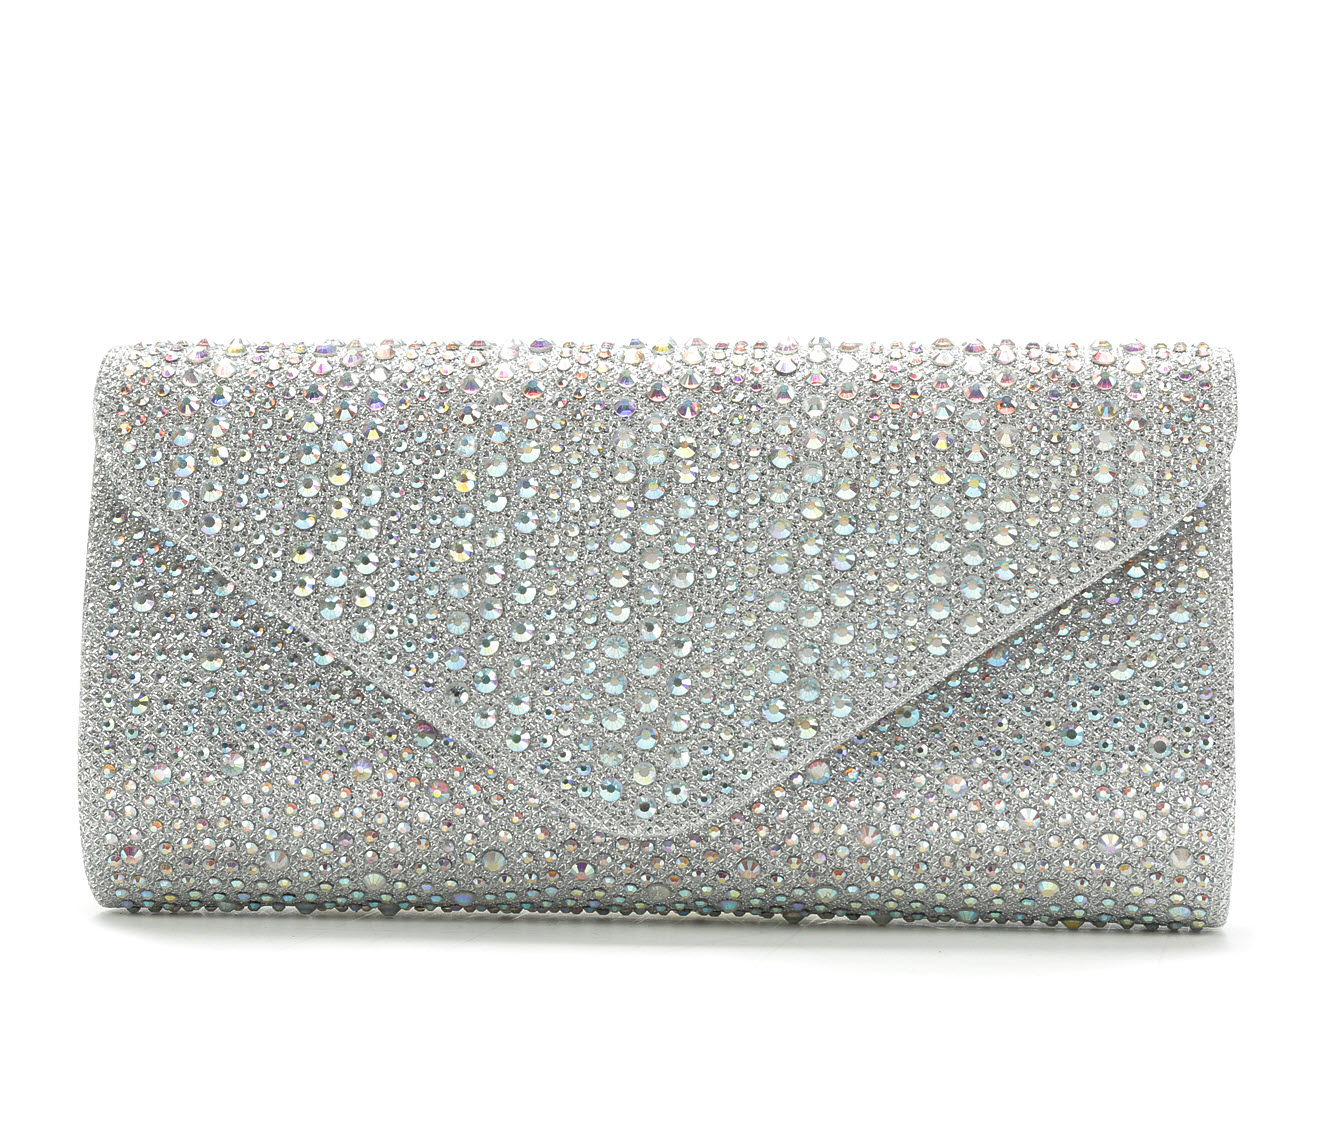 LLorraine Studded Envelope (Silver)